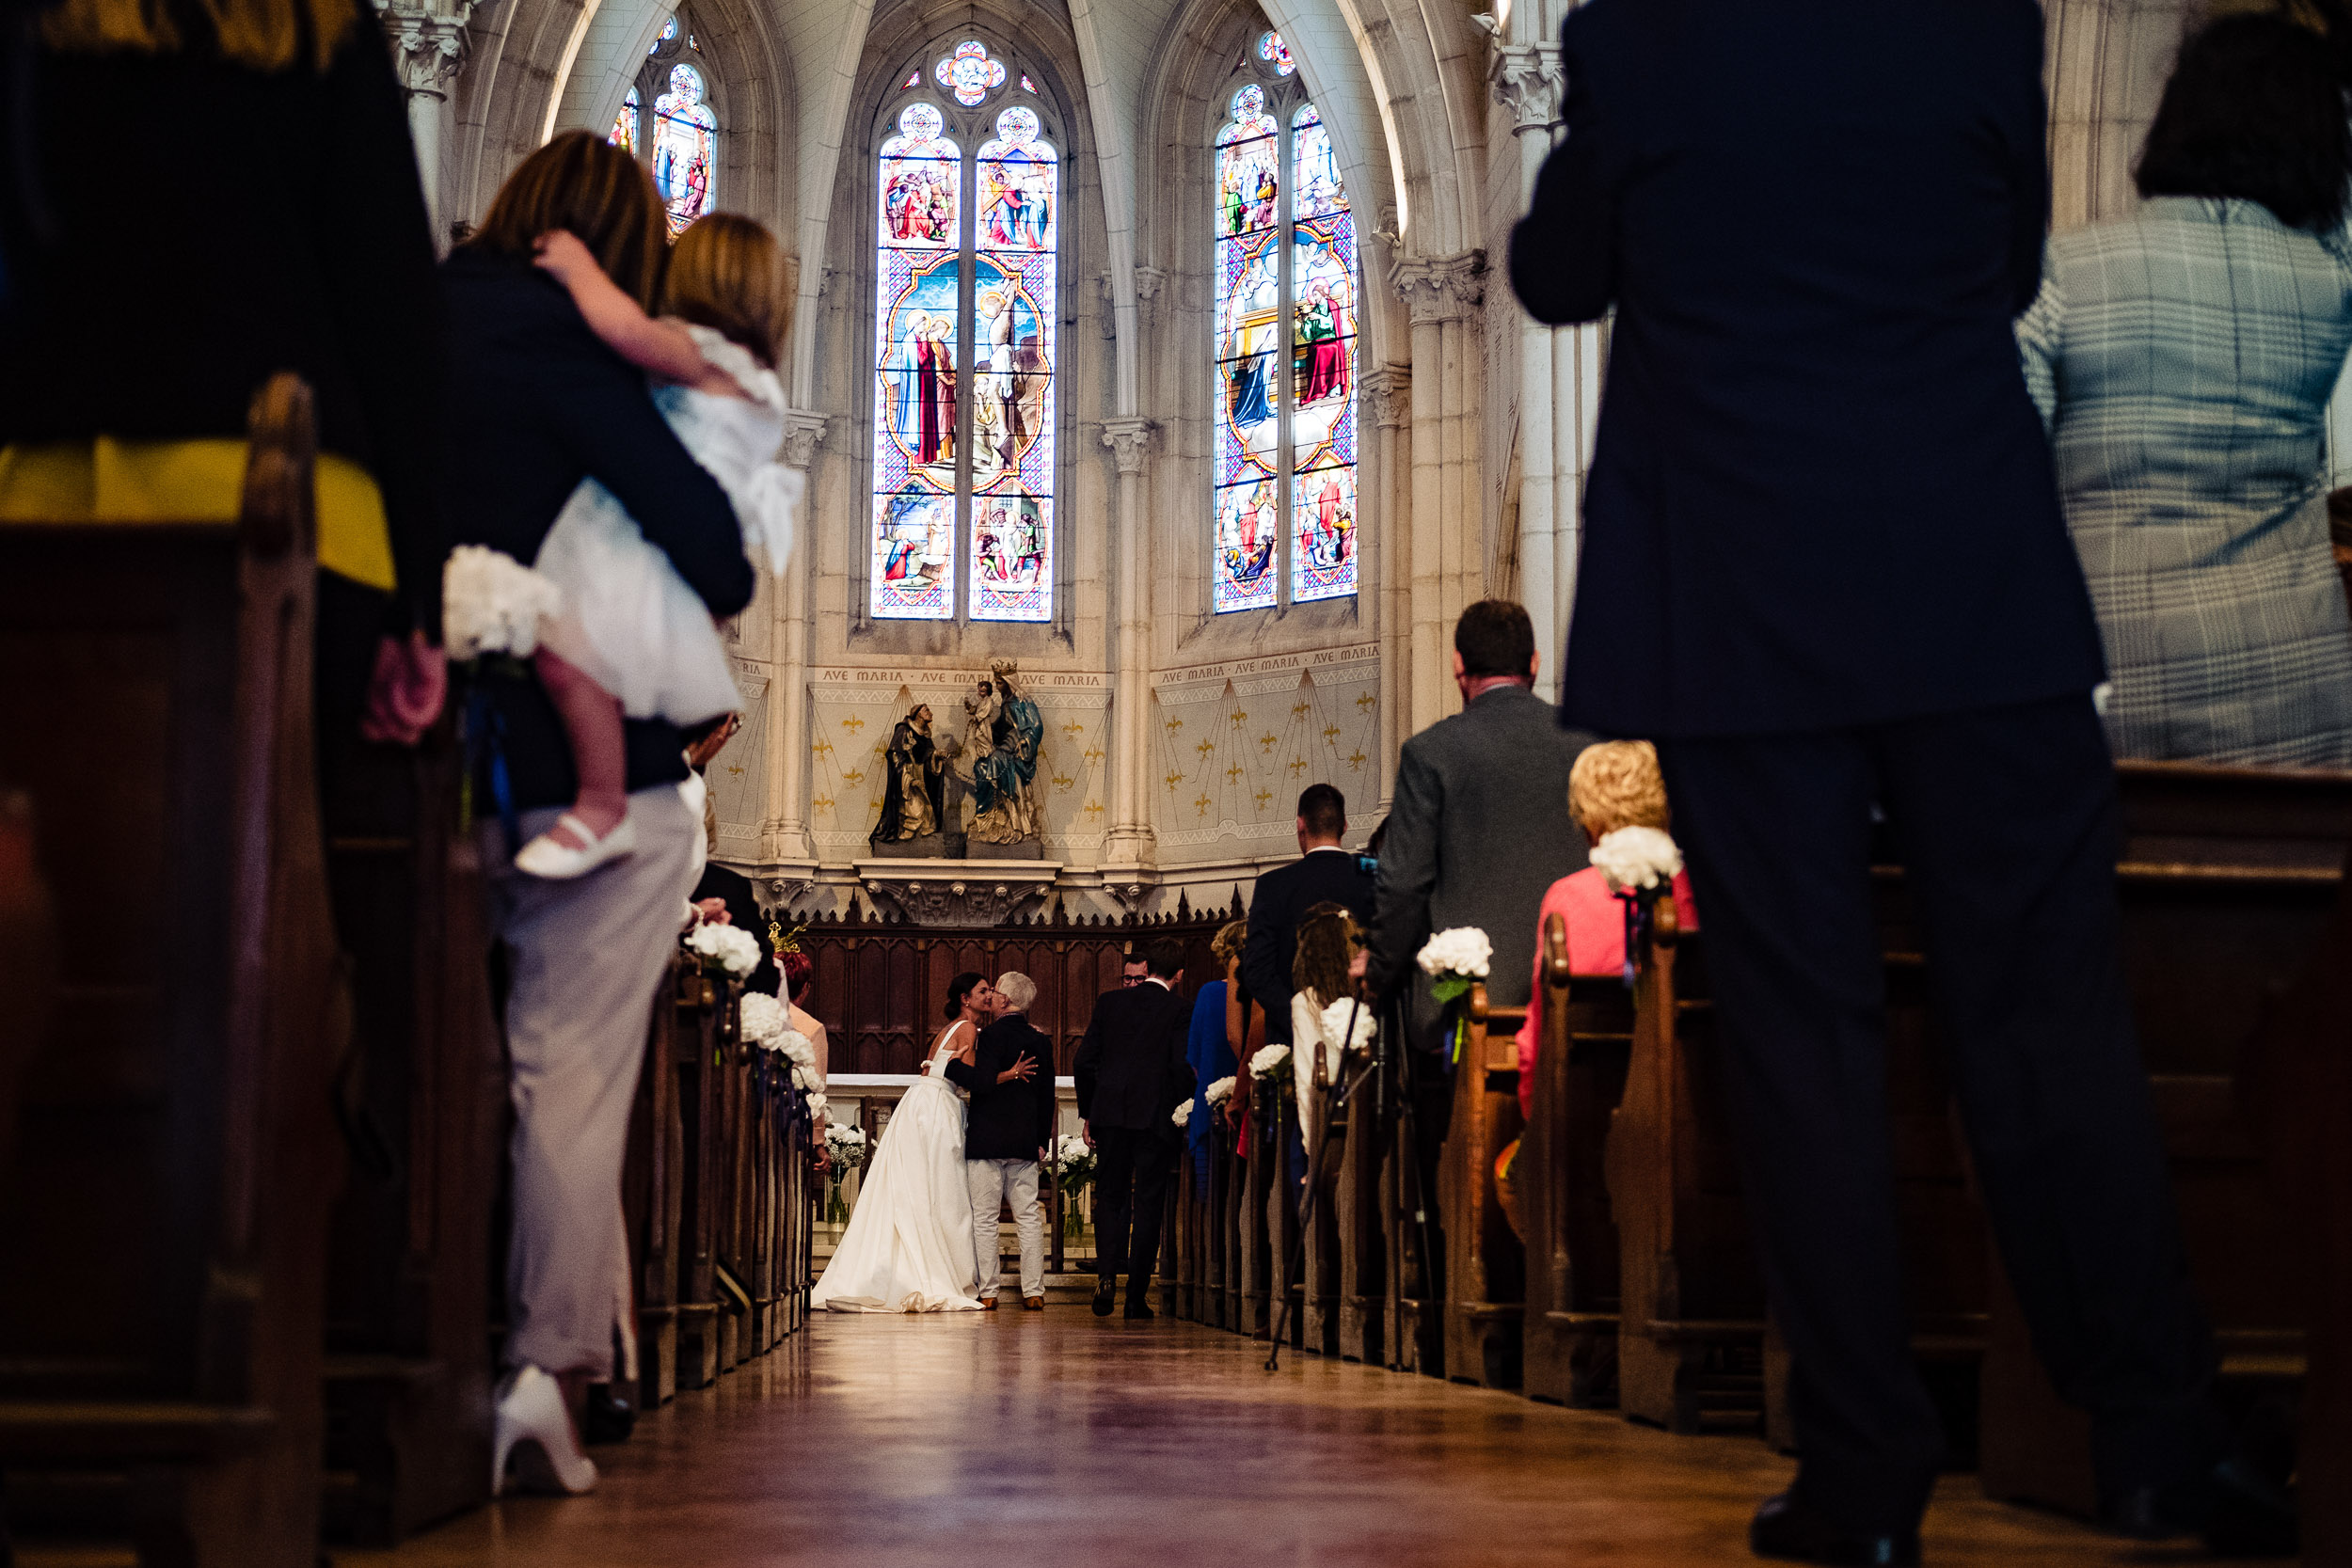 gerald-mattel-photographe-mariage-chateau-santenay-8.jpg